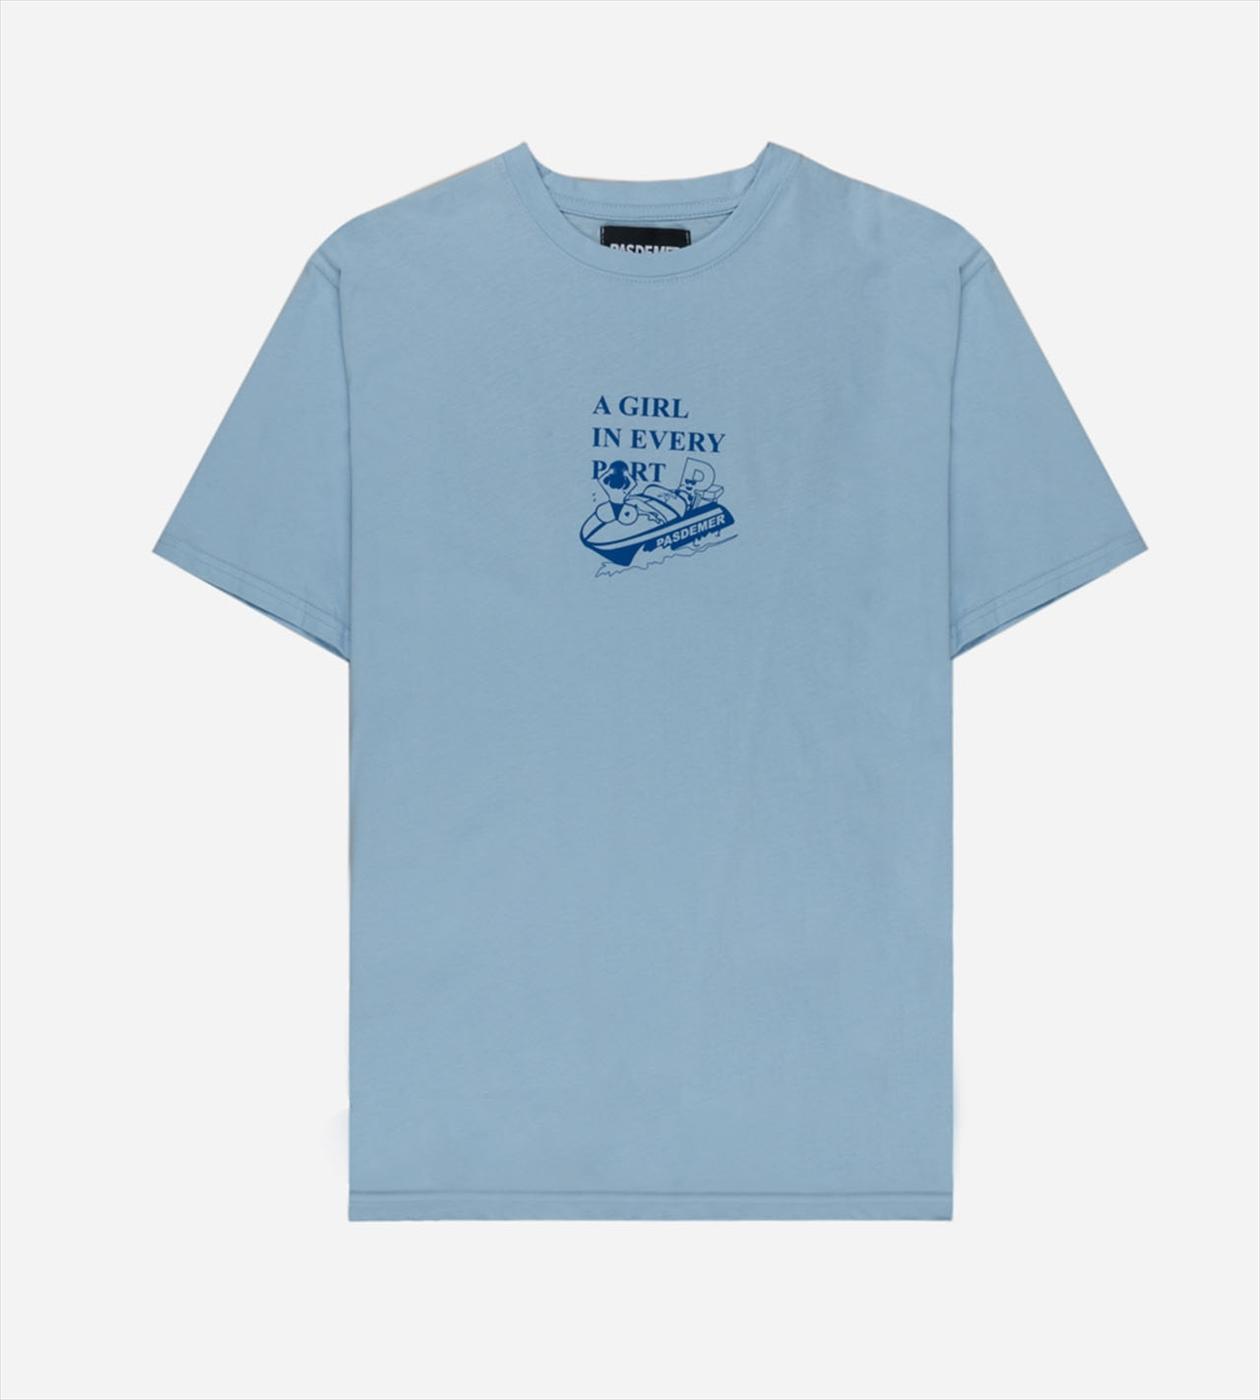 【PAS DE MER/パドゥメ】CRUISE T-SHIRT  Tシャツ / LIGHT BLUE